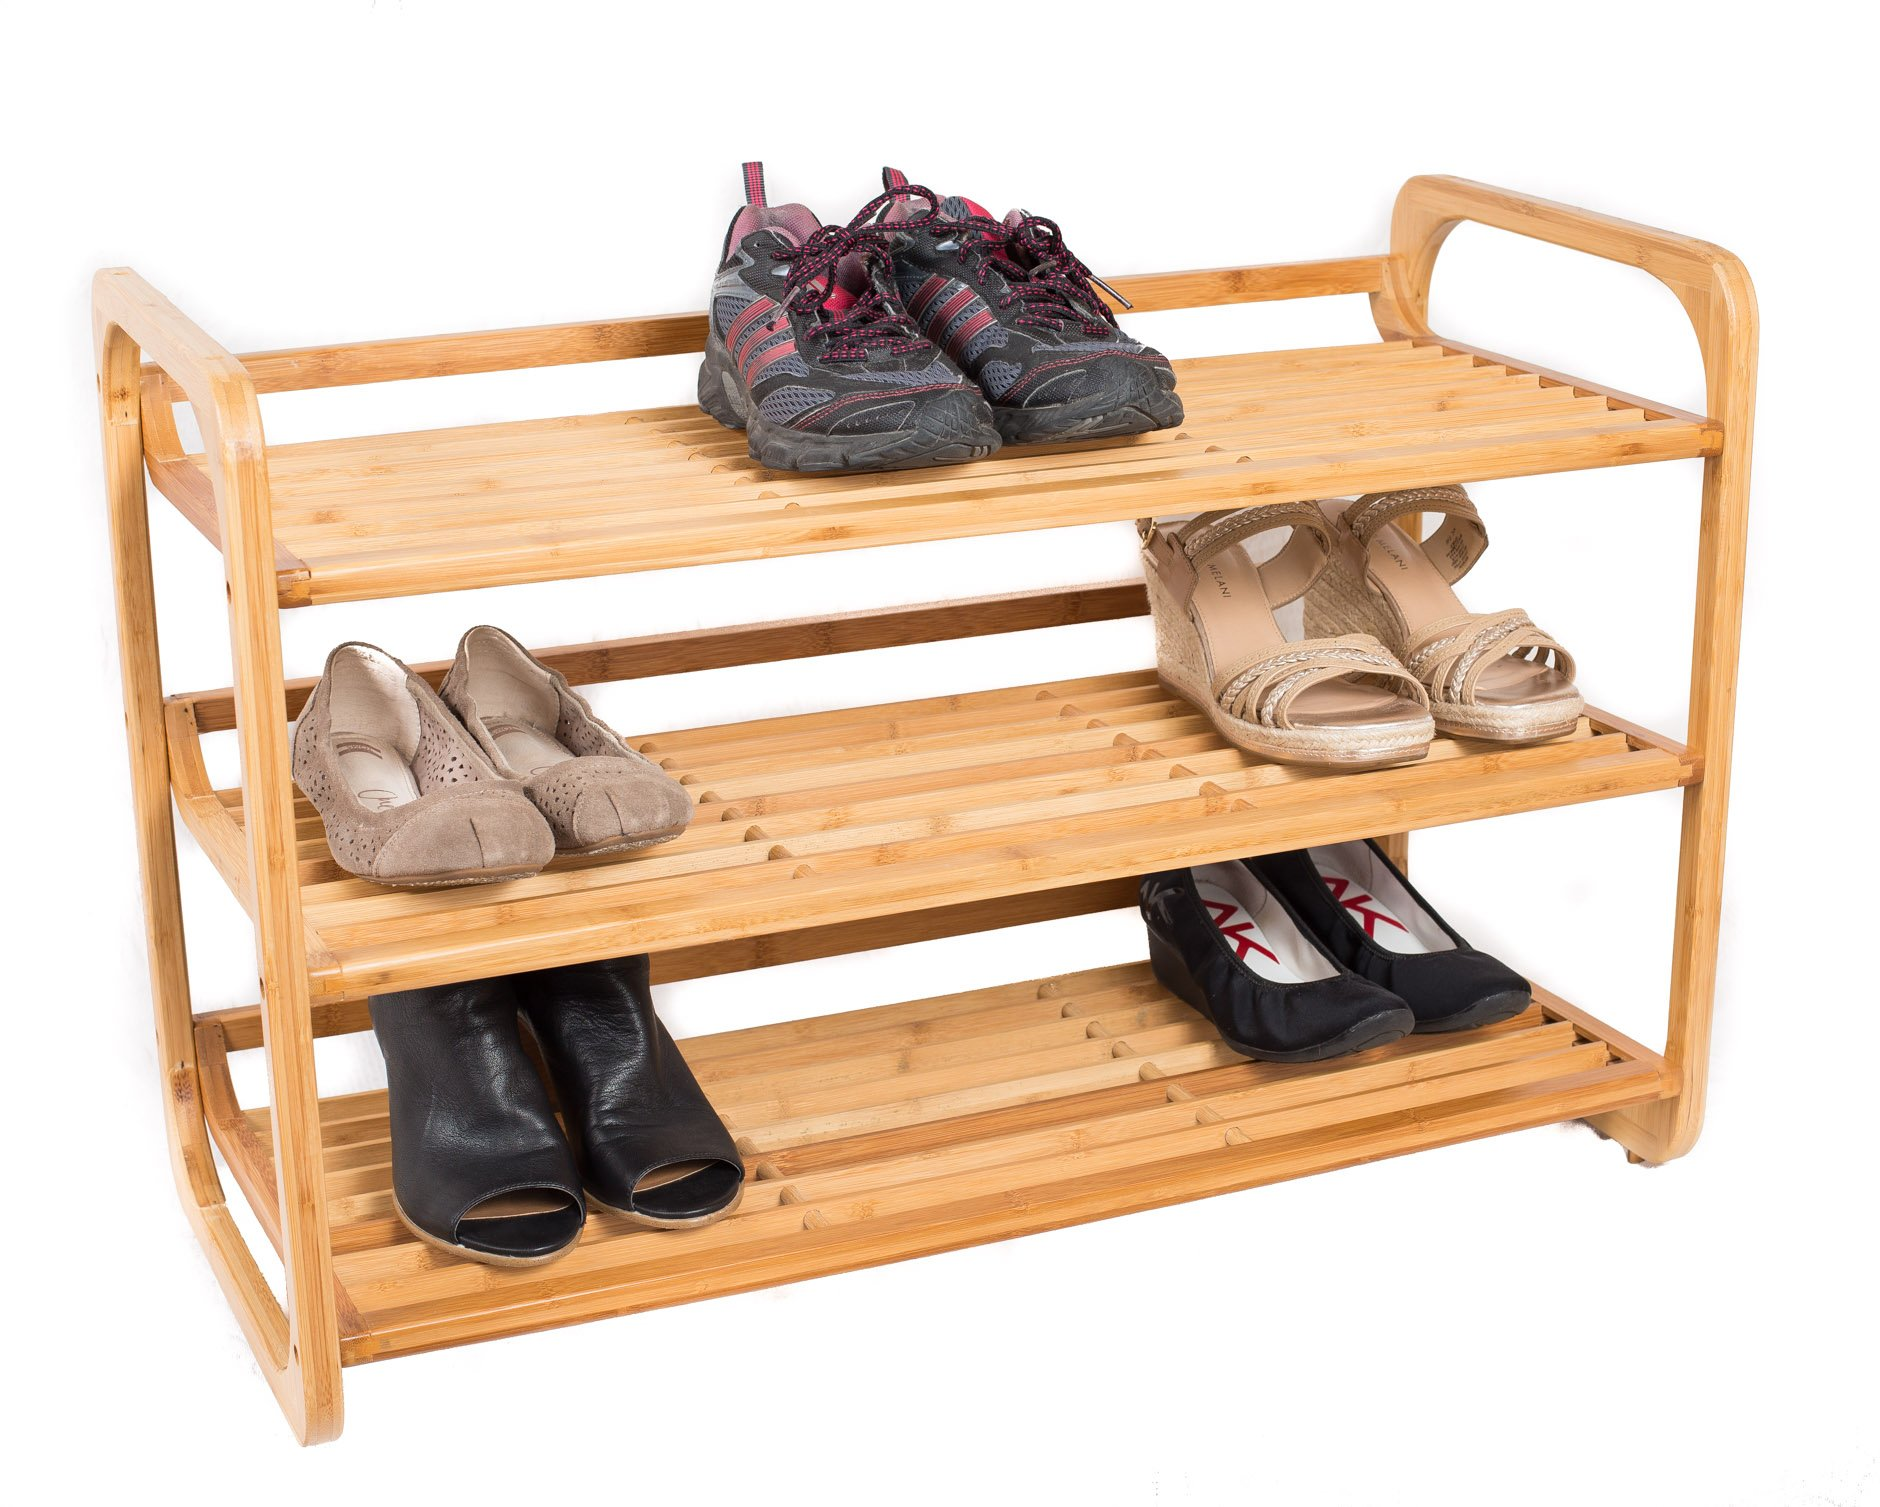 BirdRock Home 3-Tier Bamboo Shoe Rack | Environmentally Friendly | Fits 9-12 Shoes